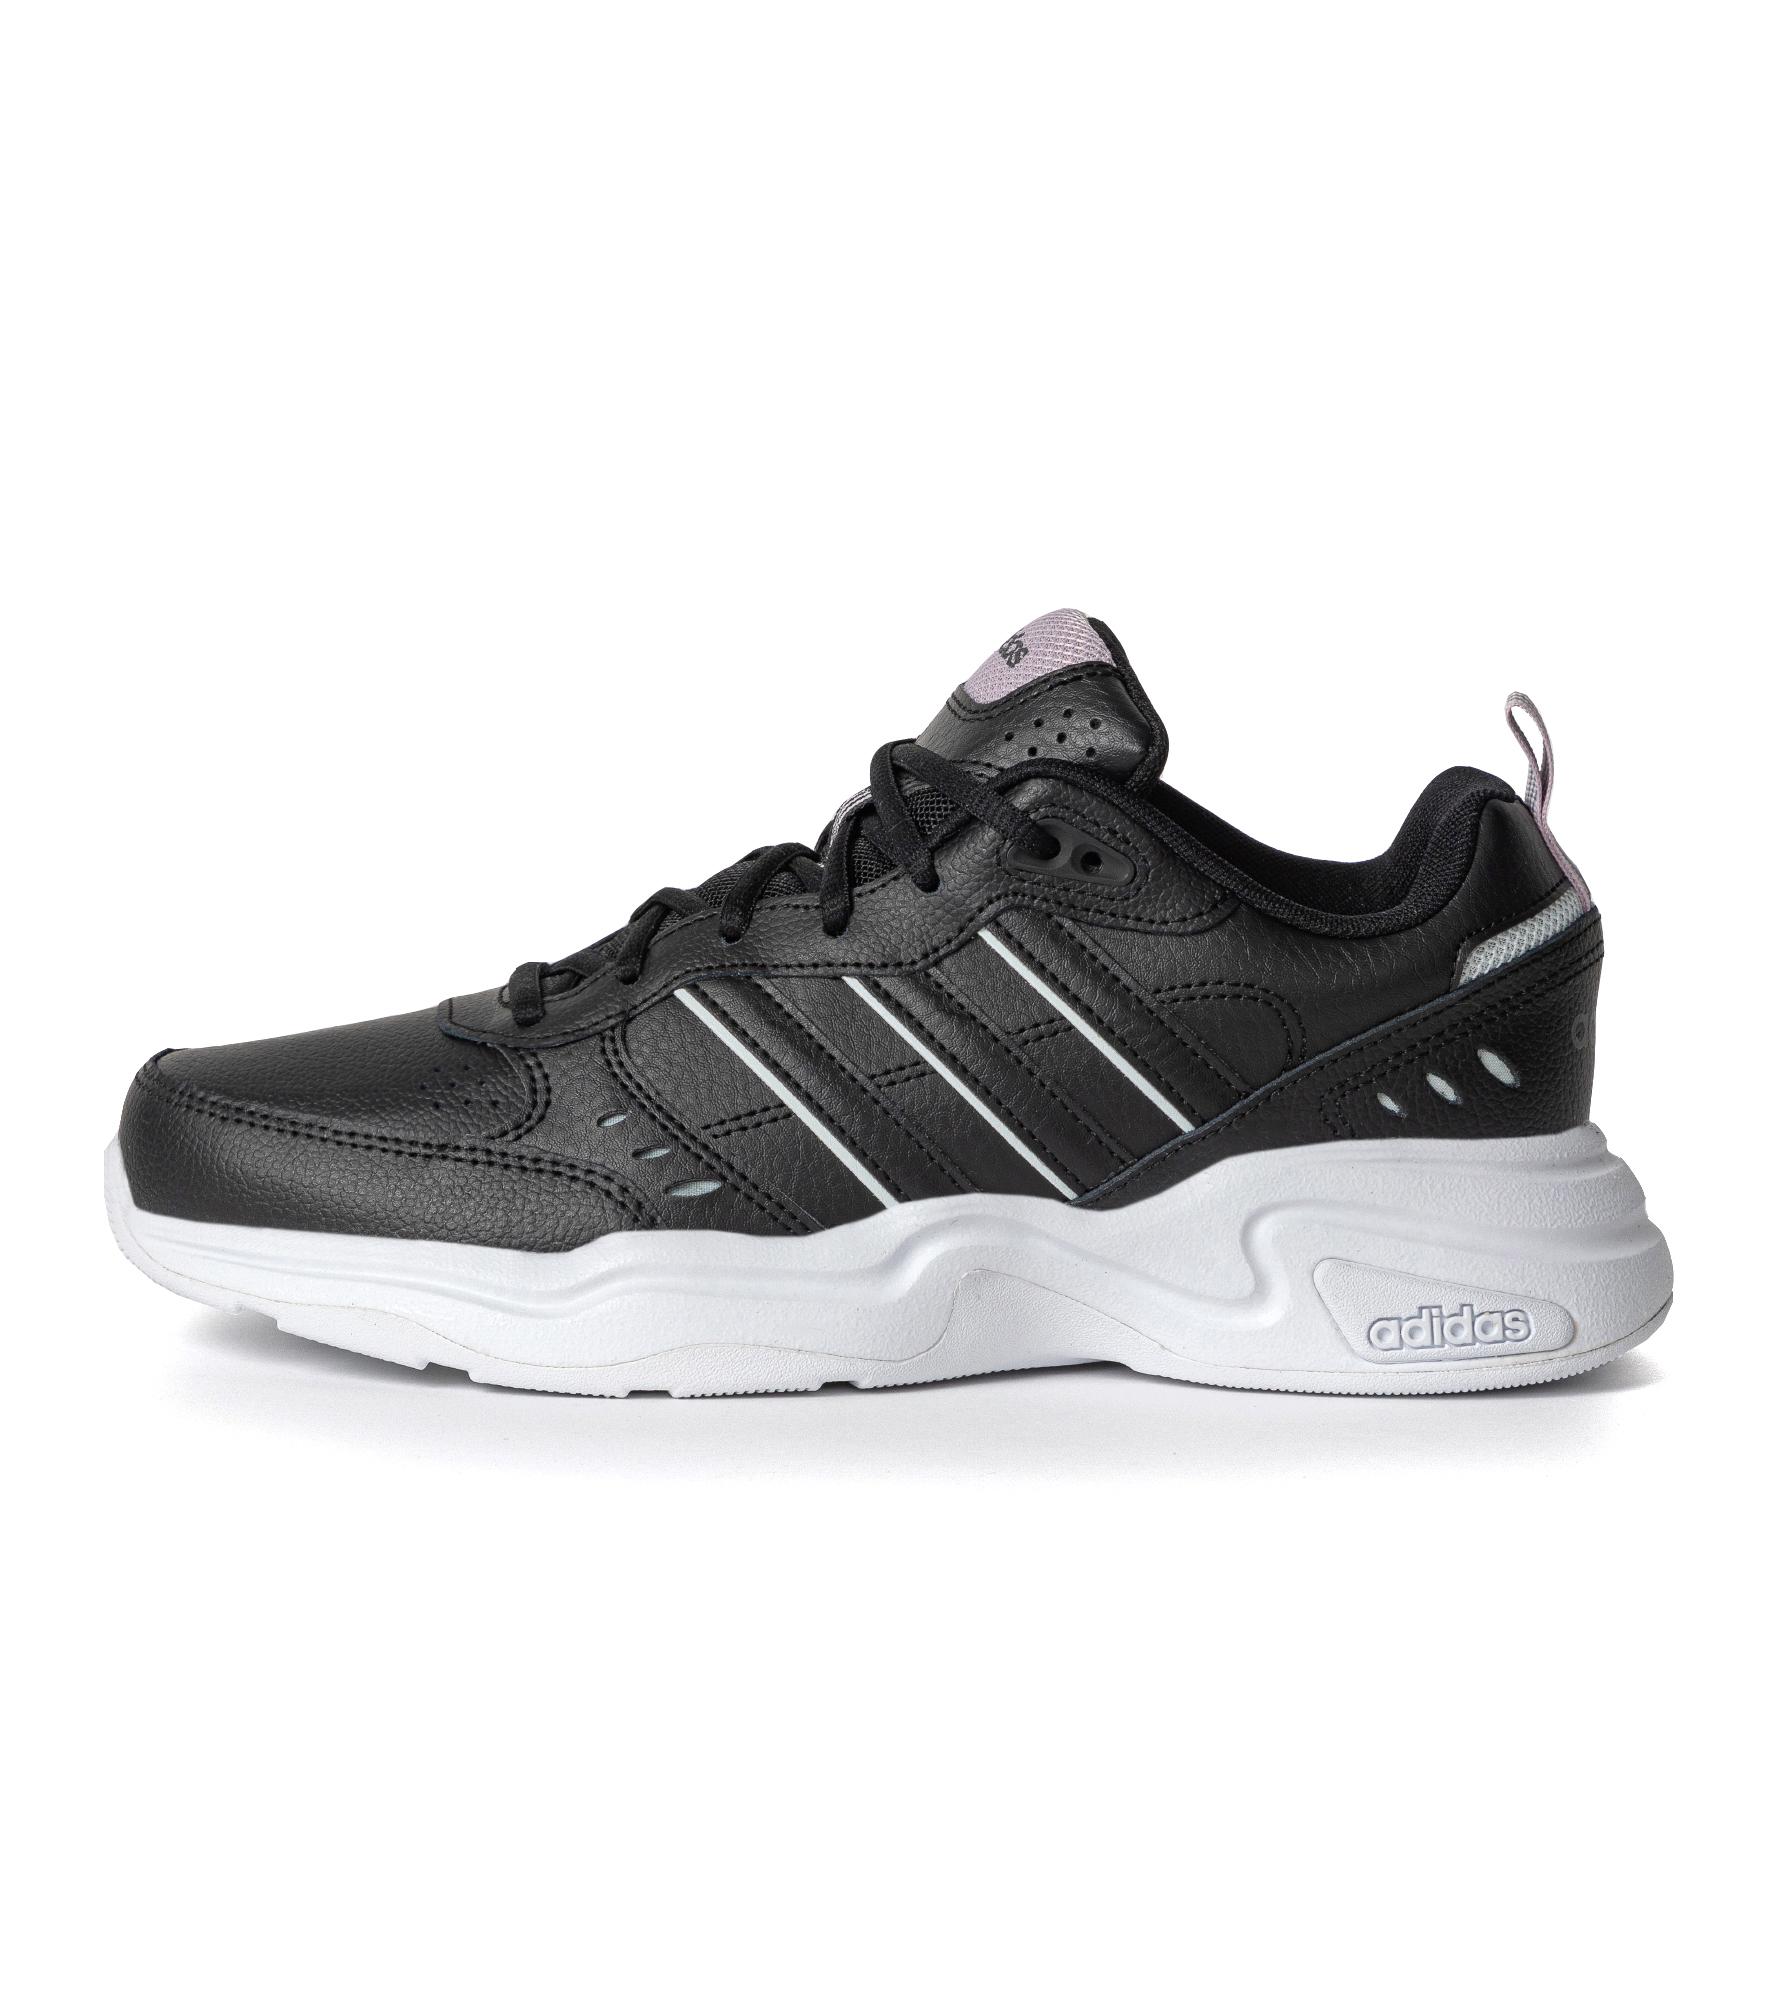 Adidas Кроссовки женские Adidas Strutter, размер 39